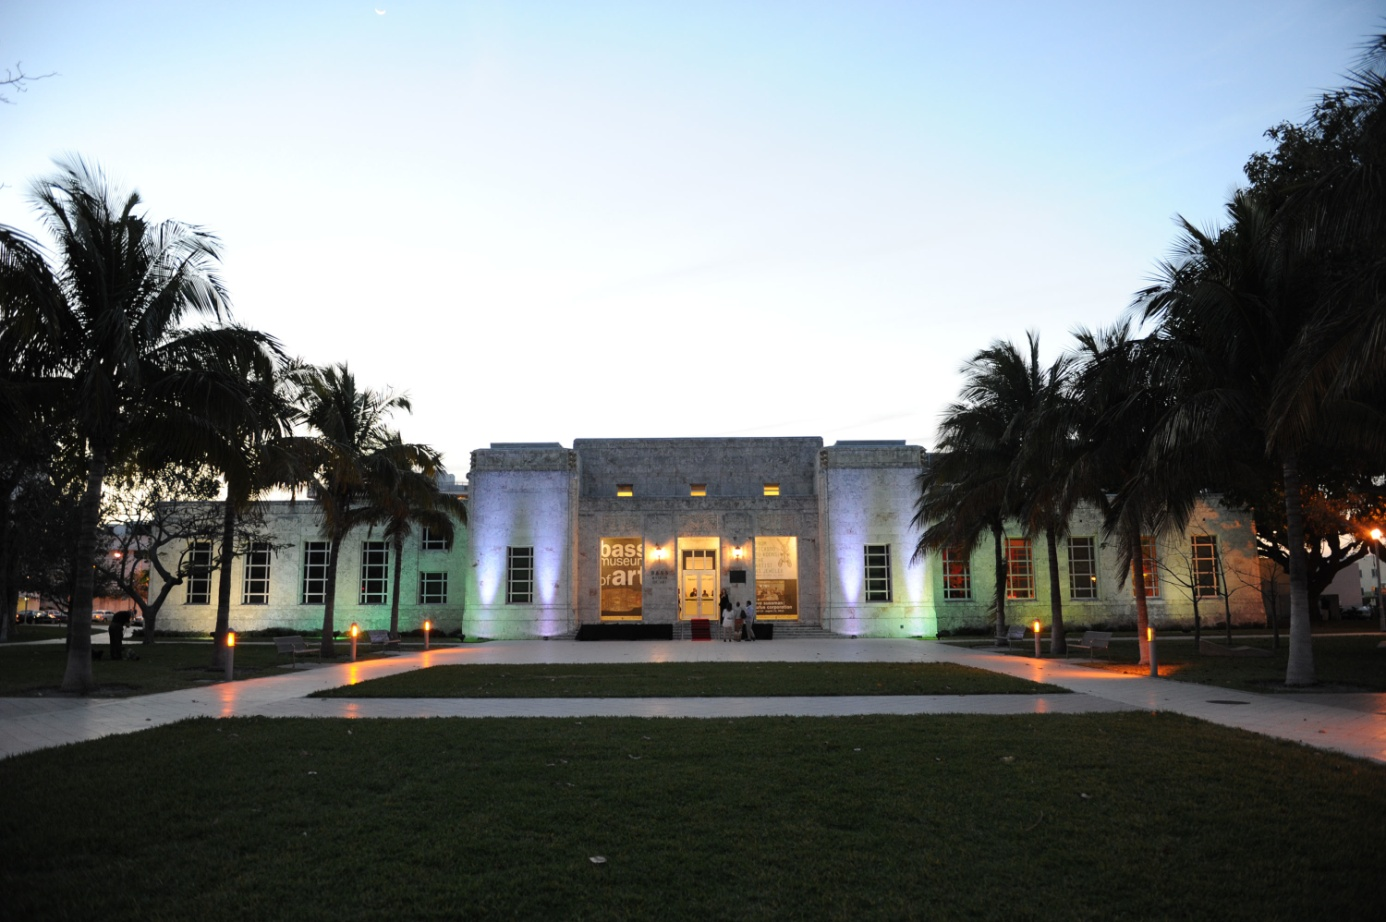 The Miami Beach Public Library and Art Center